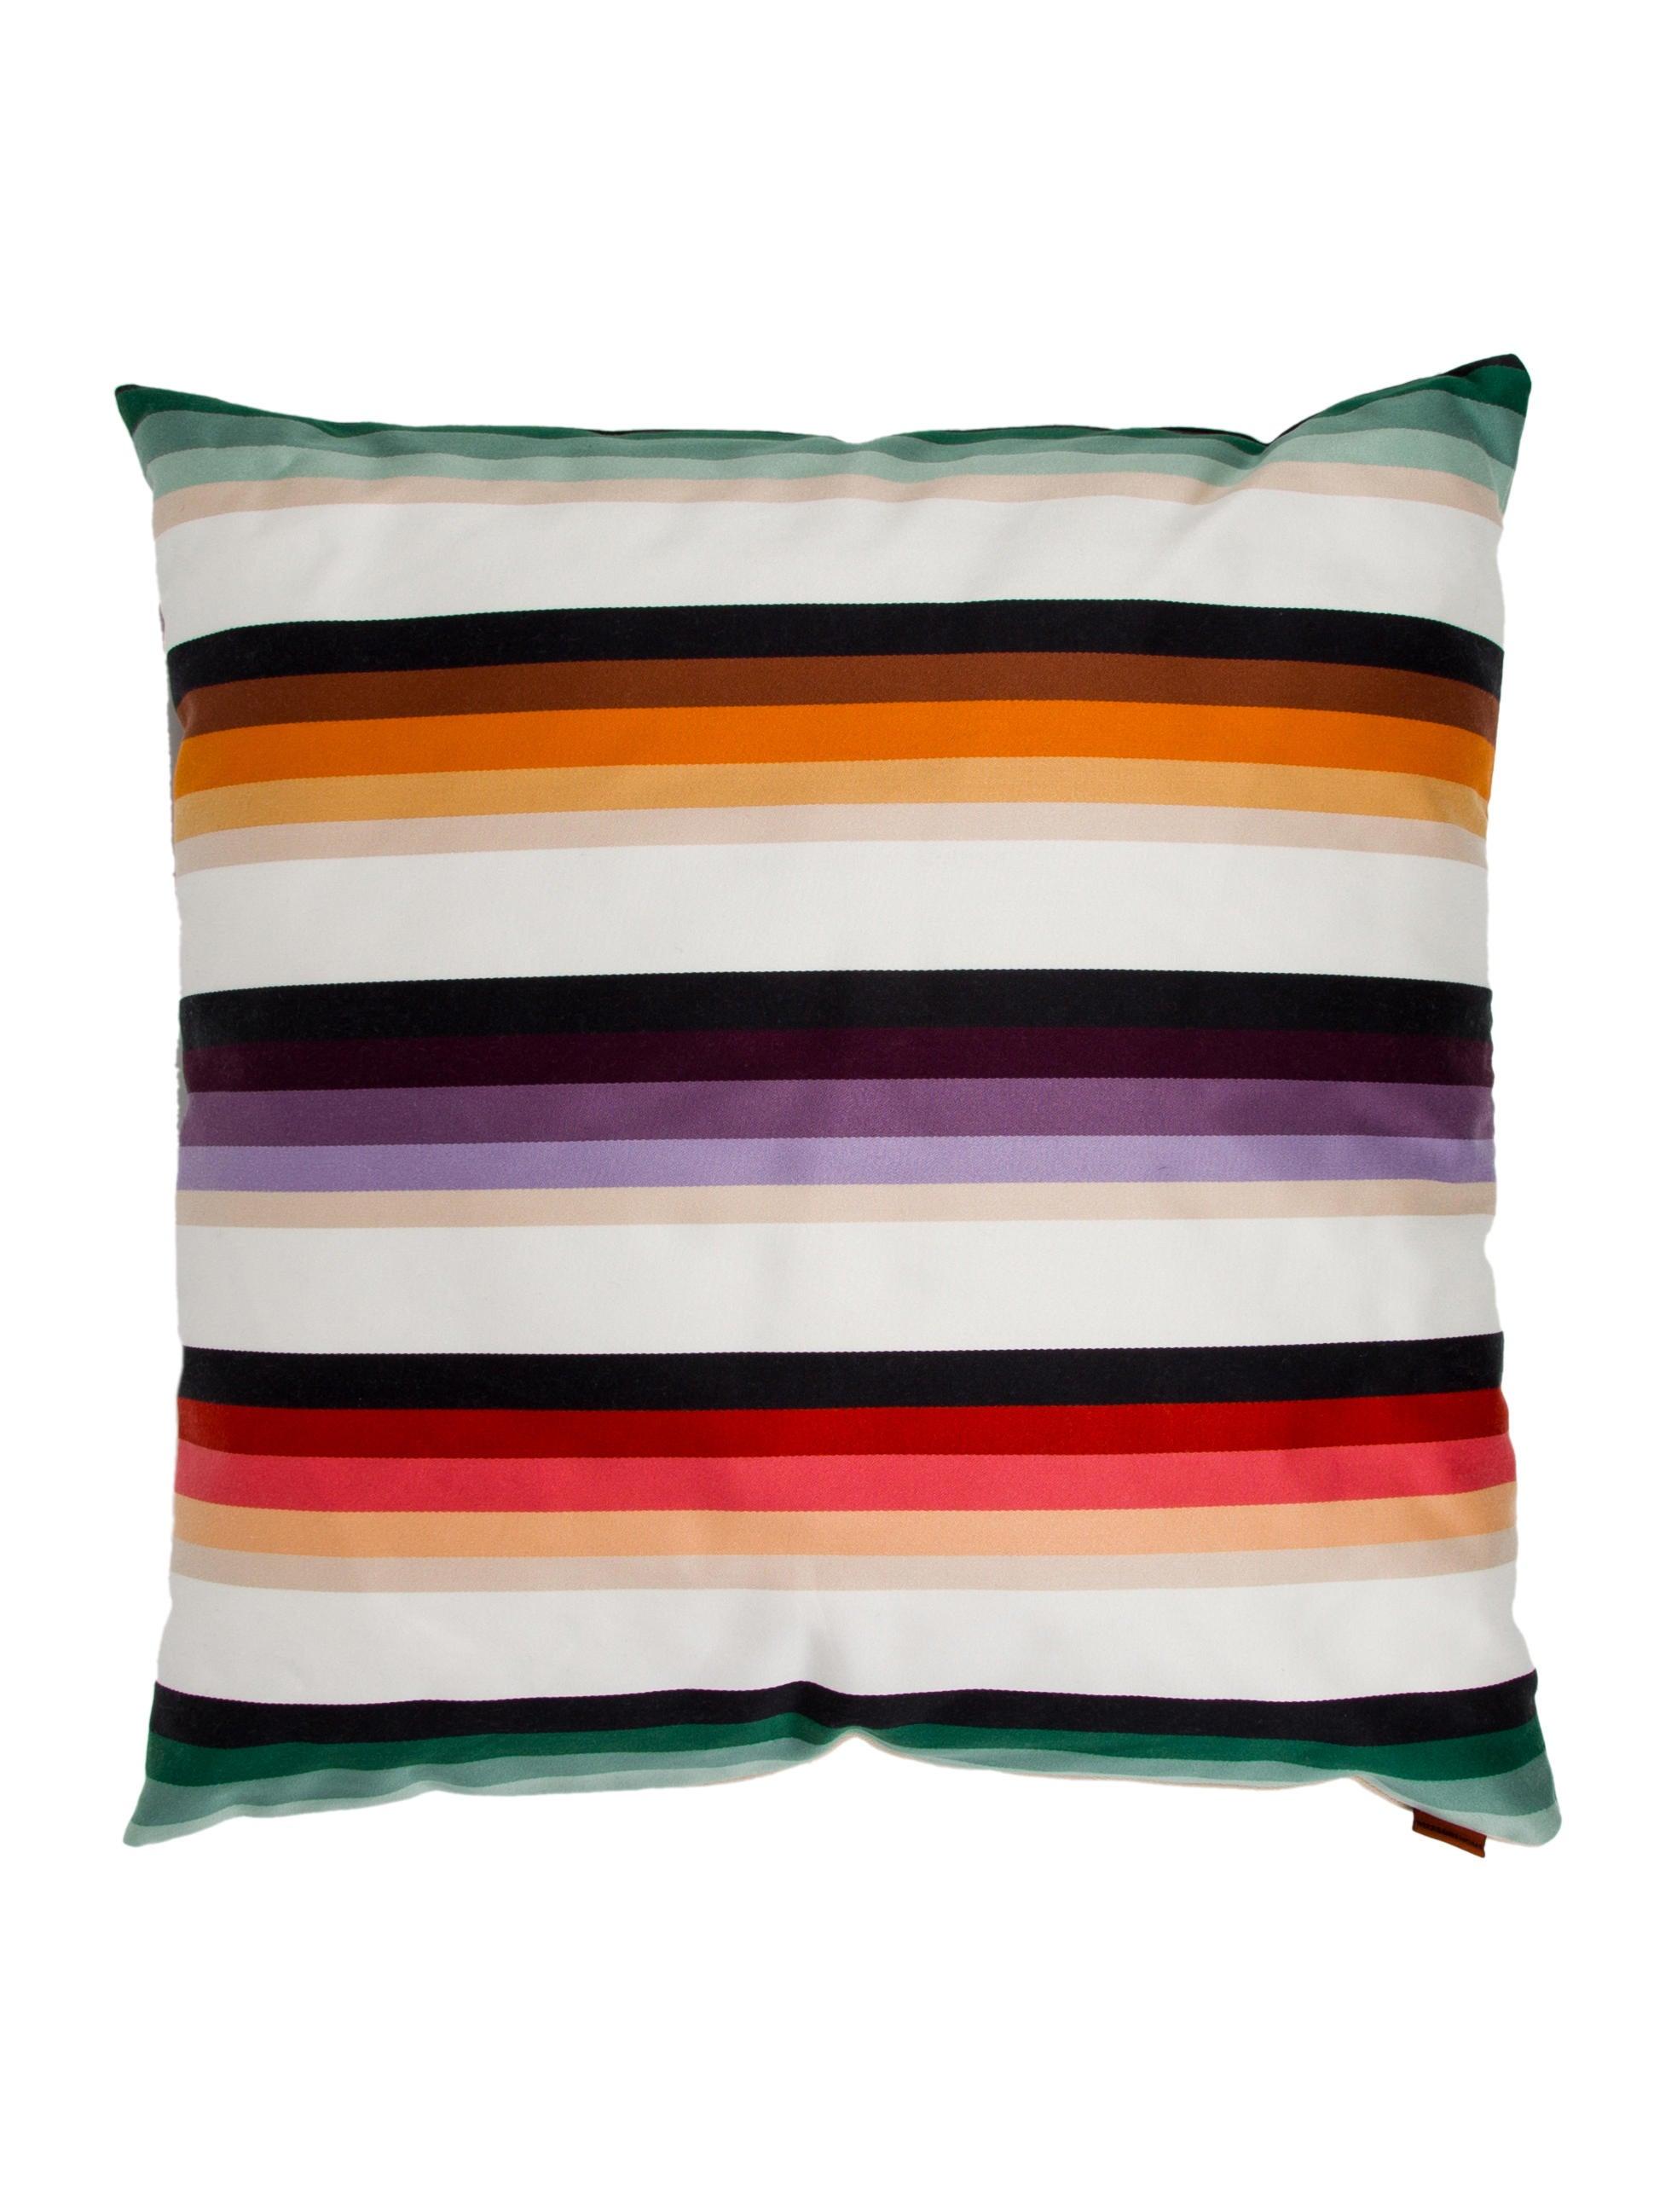 jill missoni set cover duvet pillows var pillow